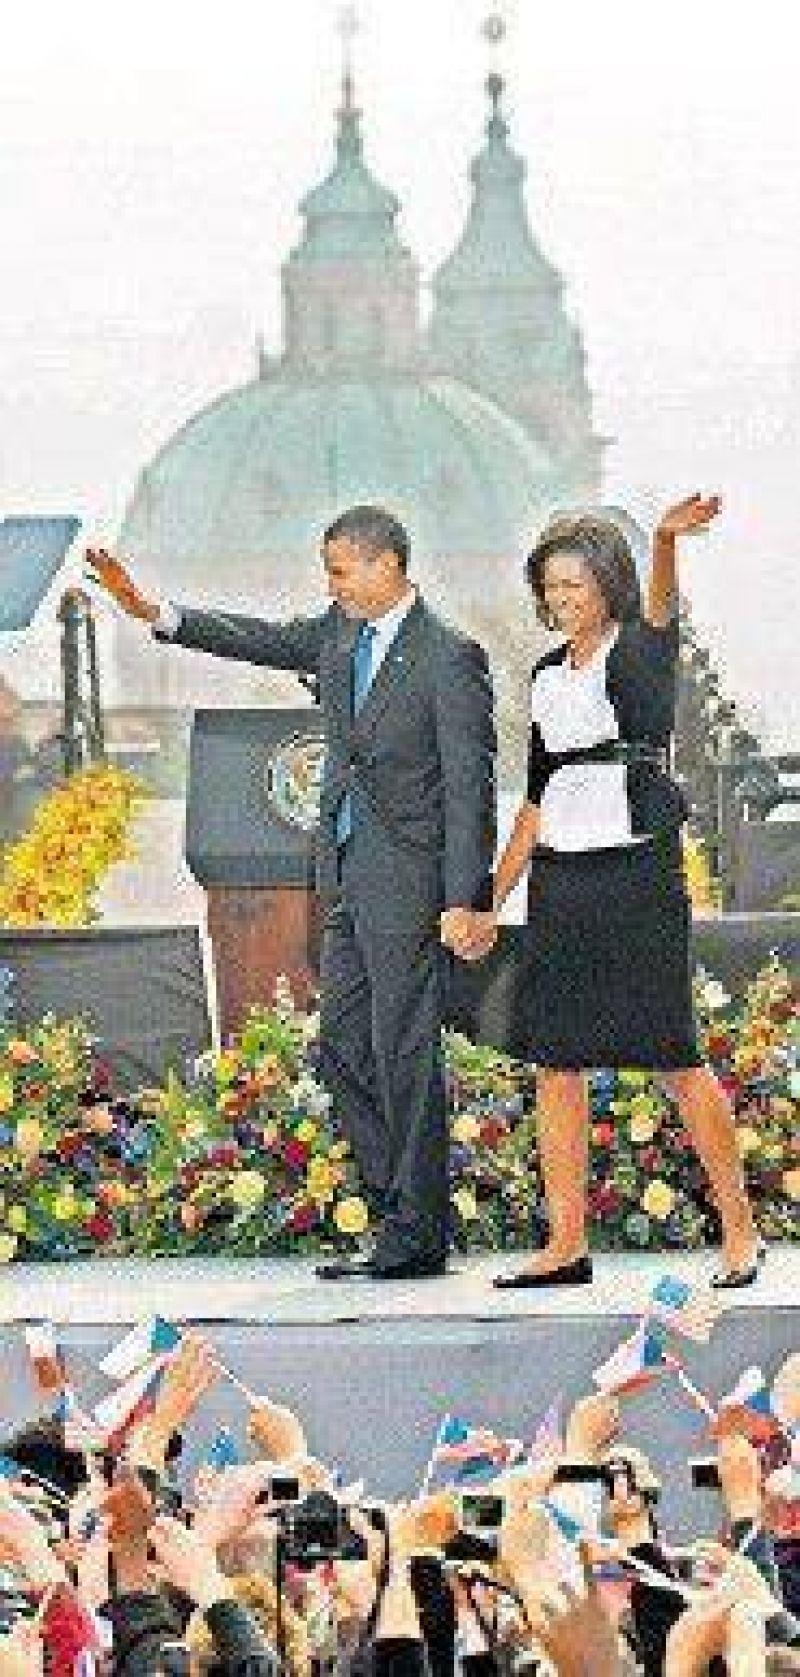 Sarkozy, enojado por un guiño de Obama a Turquía